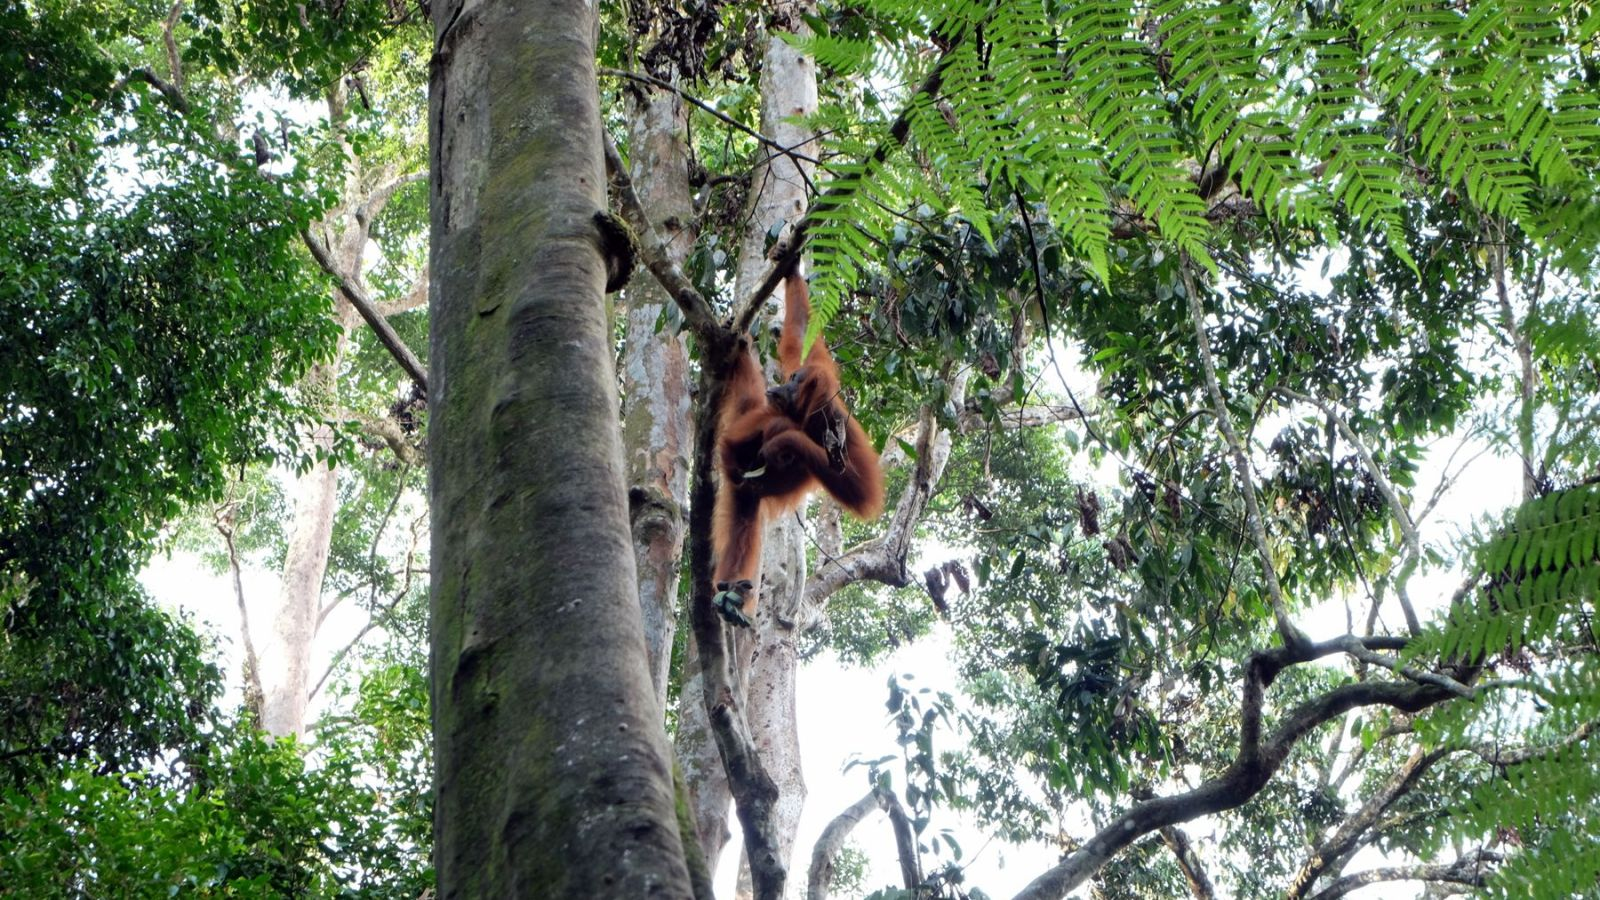 a photo of a orang utan hanging in a tree in bukit lawang.